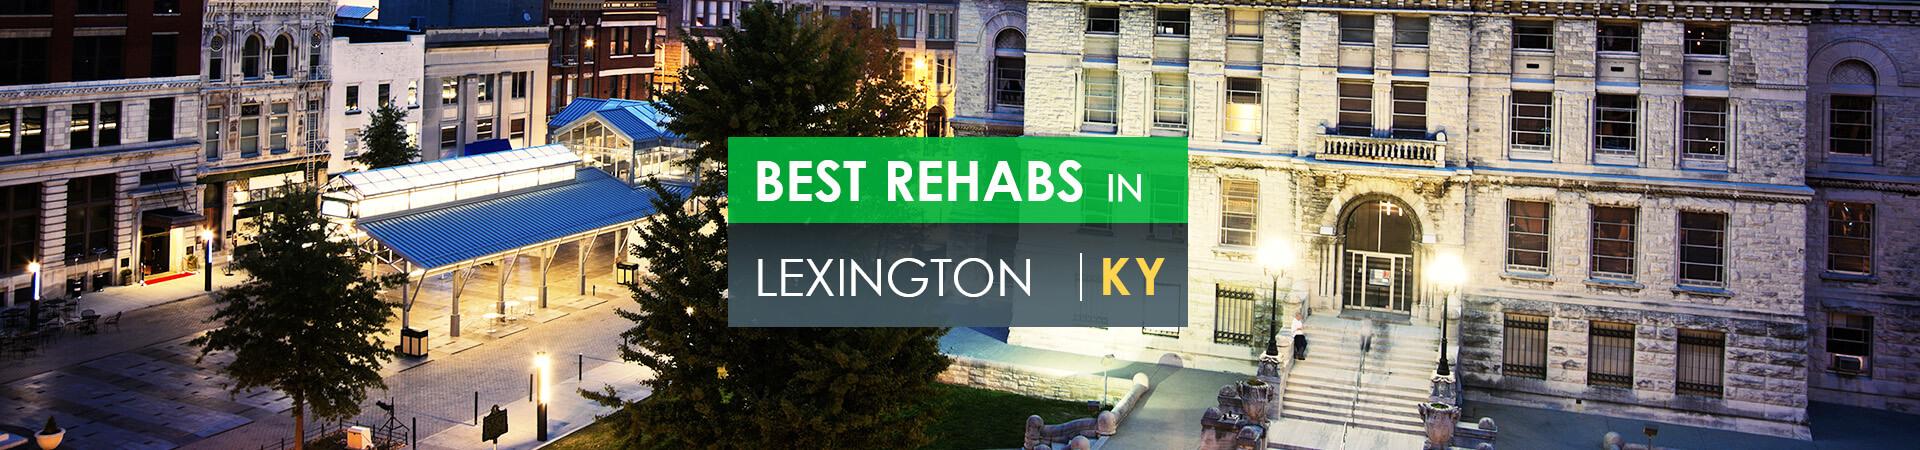 Best rehabs in Lexington, KY